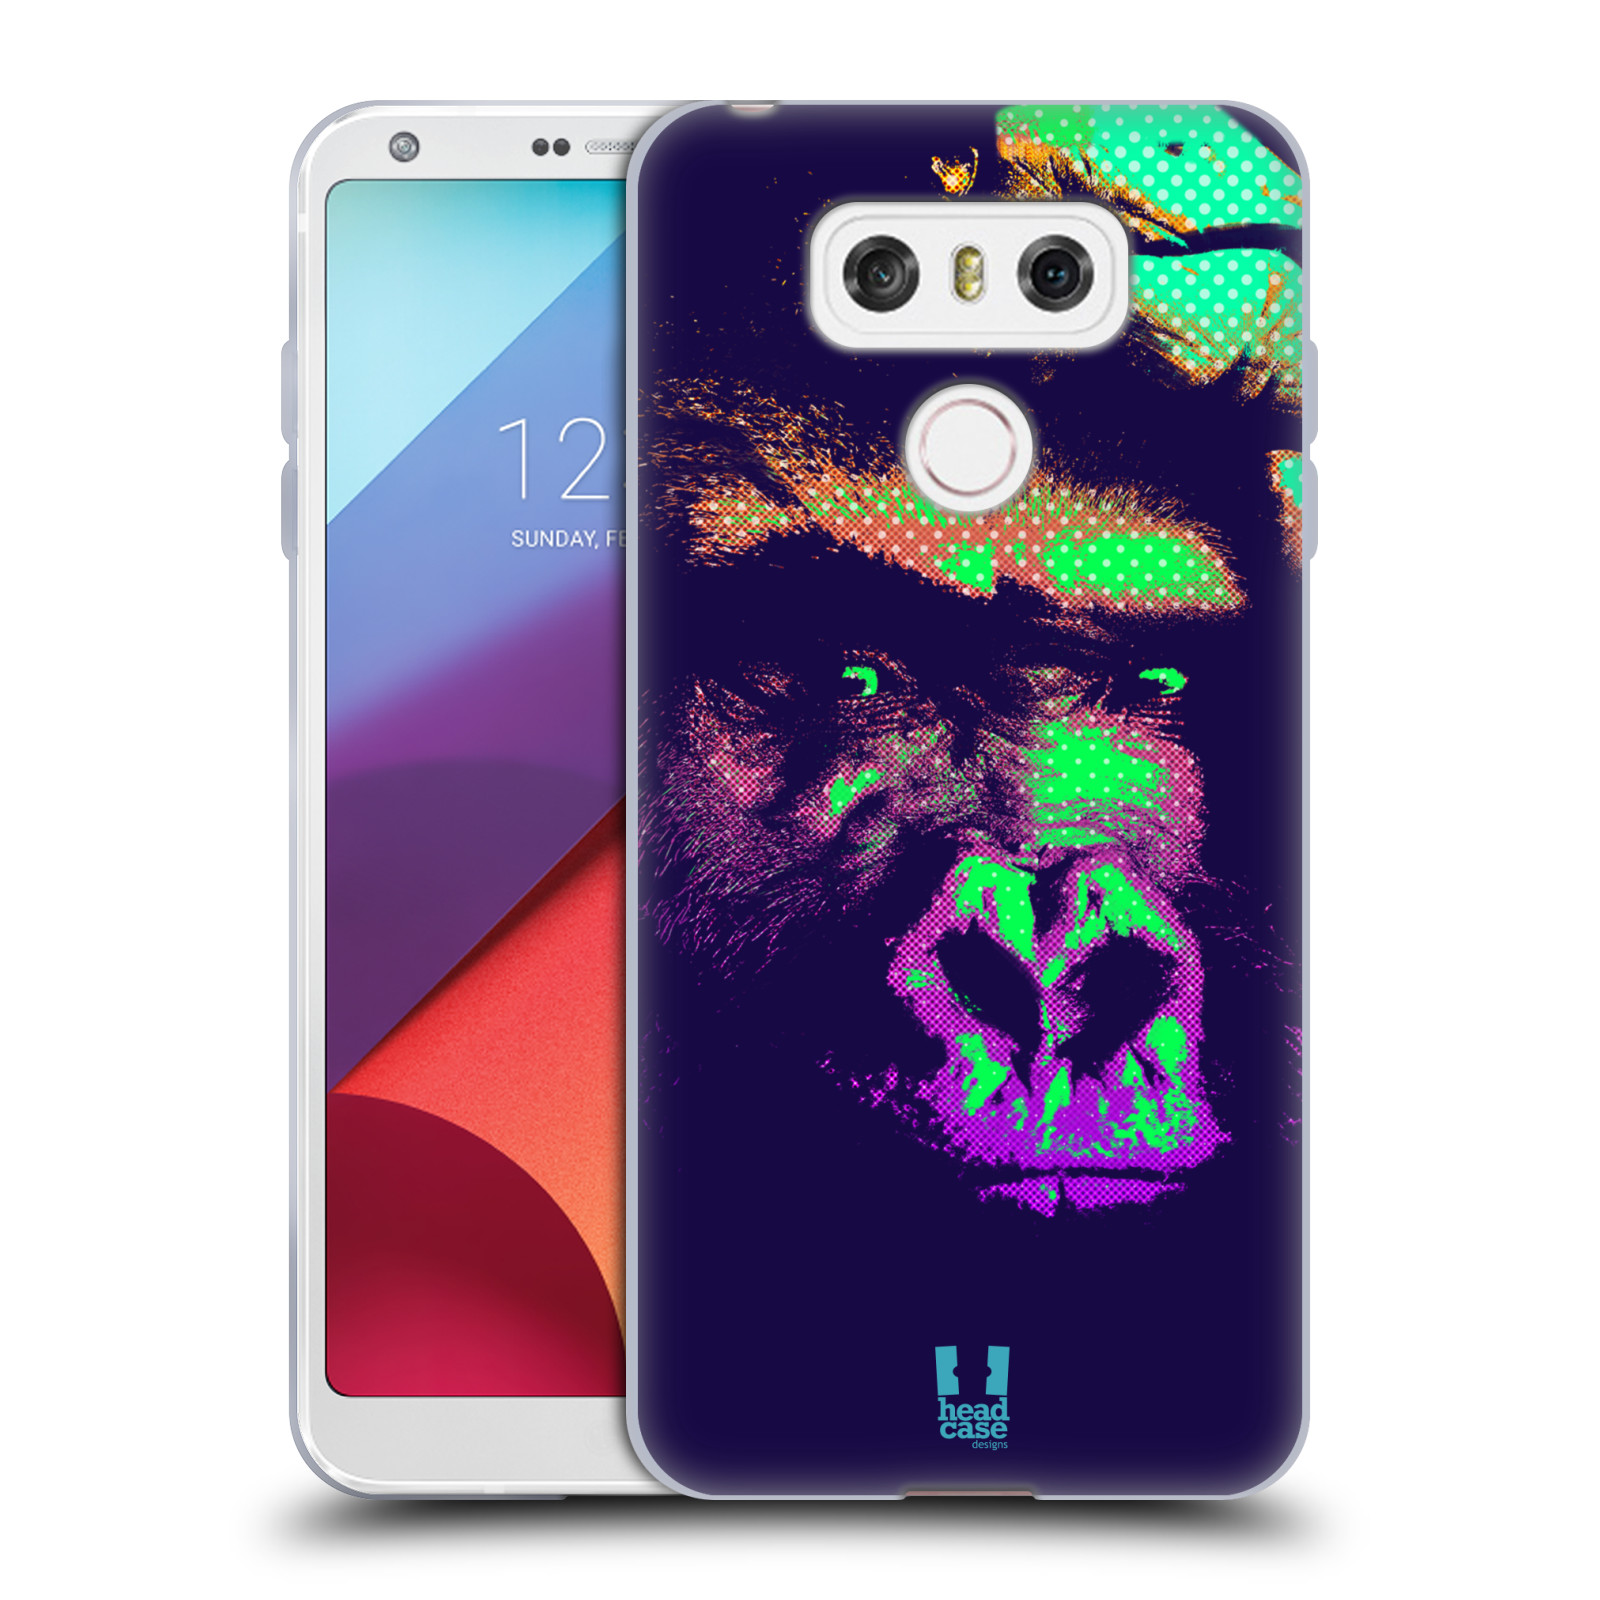 Silikonové pouzdro na mobil LG G6 - Head Case POP PRINT GORILA (Silikonový kryt či obal na mobilní telefon LG G6 H870 / LG G6 Dual SIM H870DS)